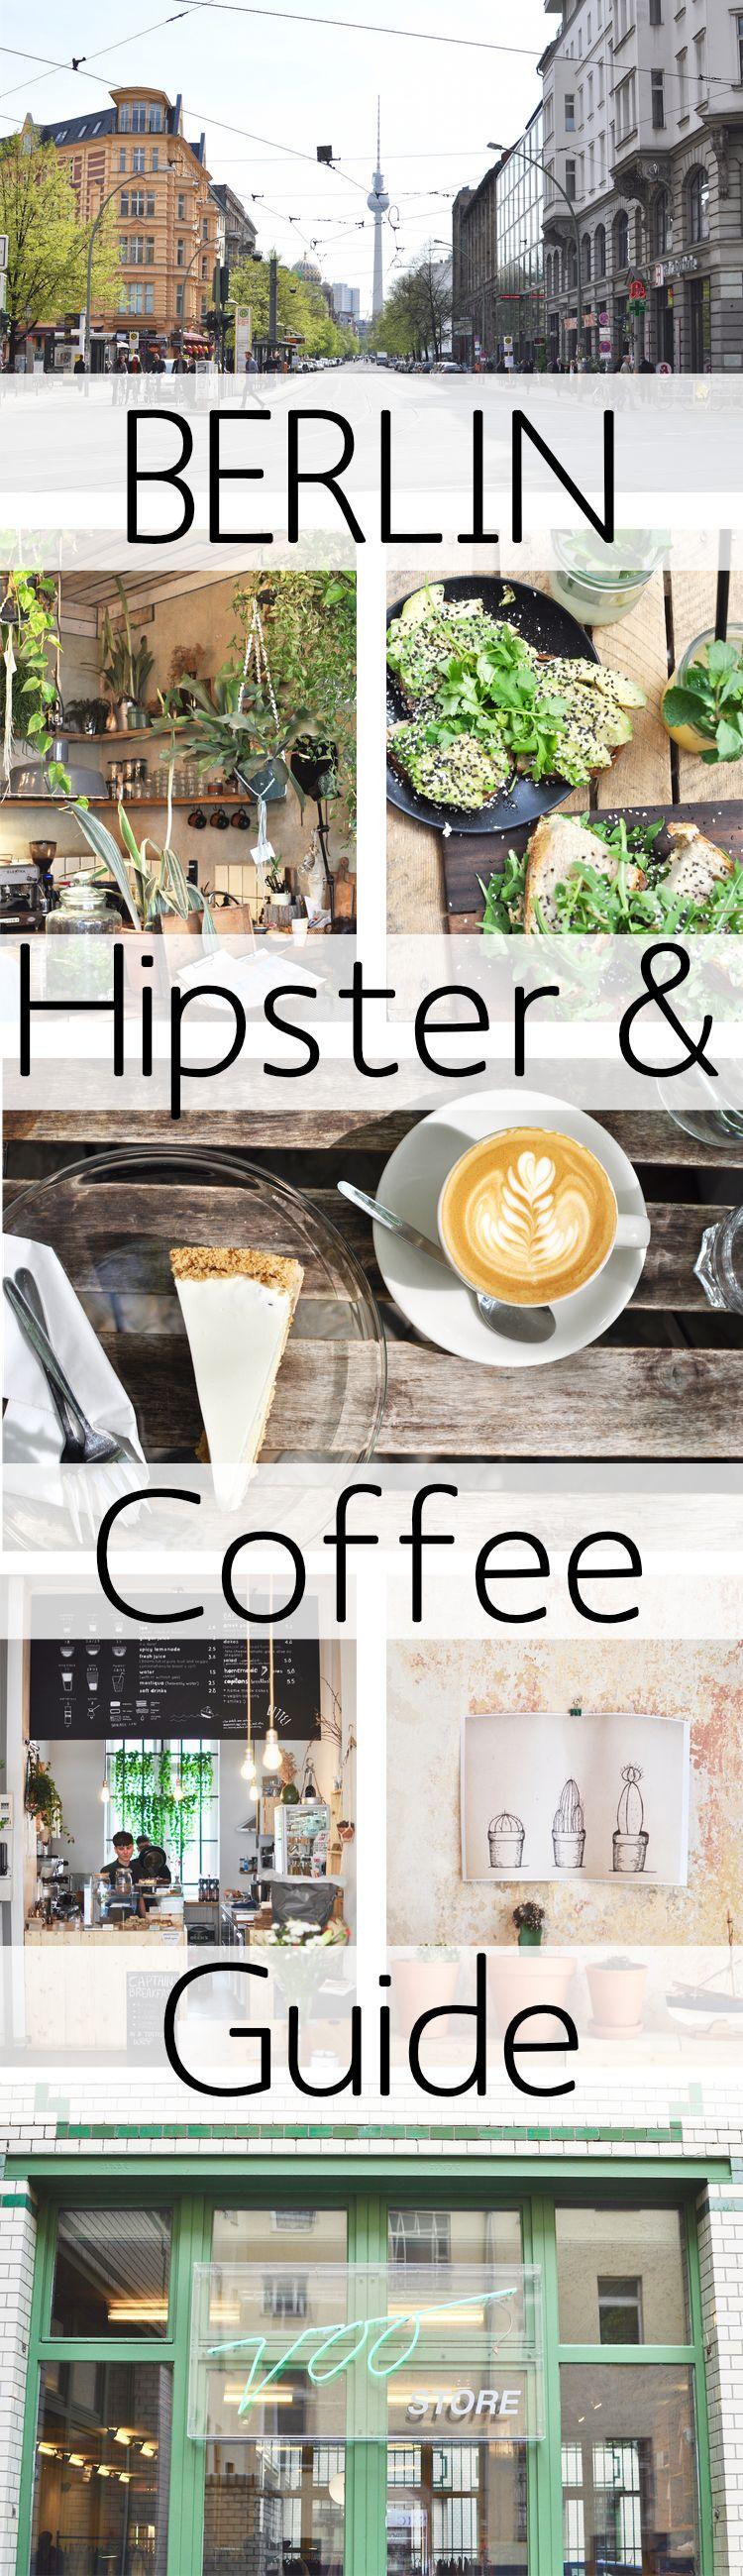 berlin travel coffee guide pinterest caf viajar y alemania. Black Bedroom Furniture Sets. Home Design Ideas